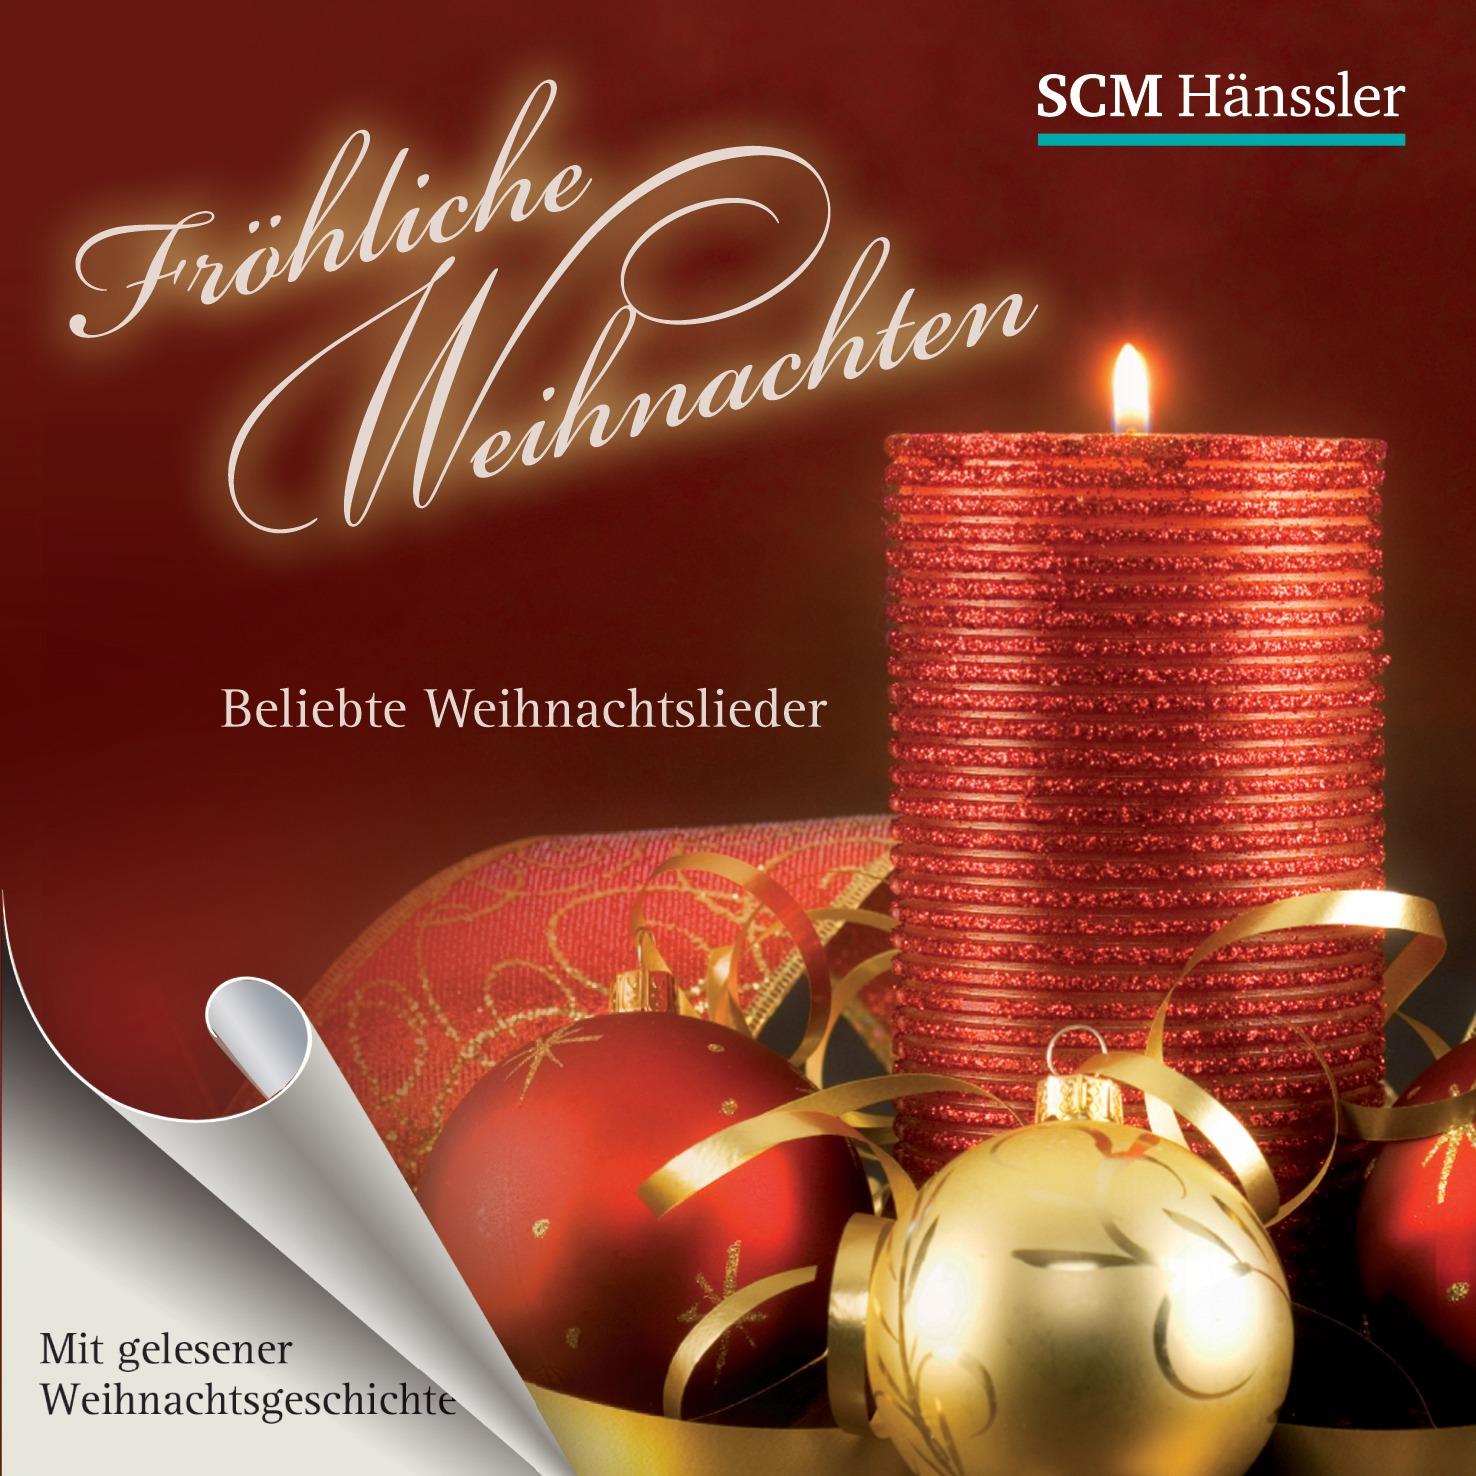 fr hliche weihnachten mp3 album download scm h nssler. Black Bedroom Furniture Sets. Home Design Ideas